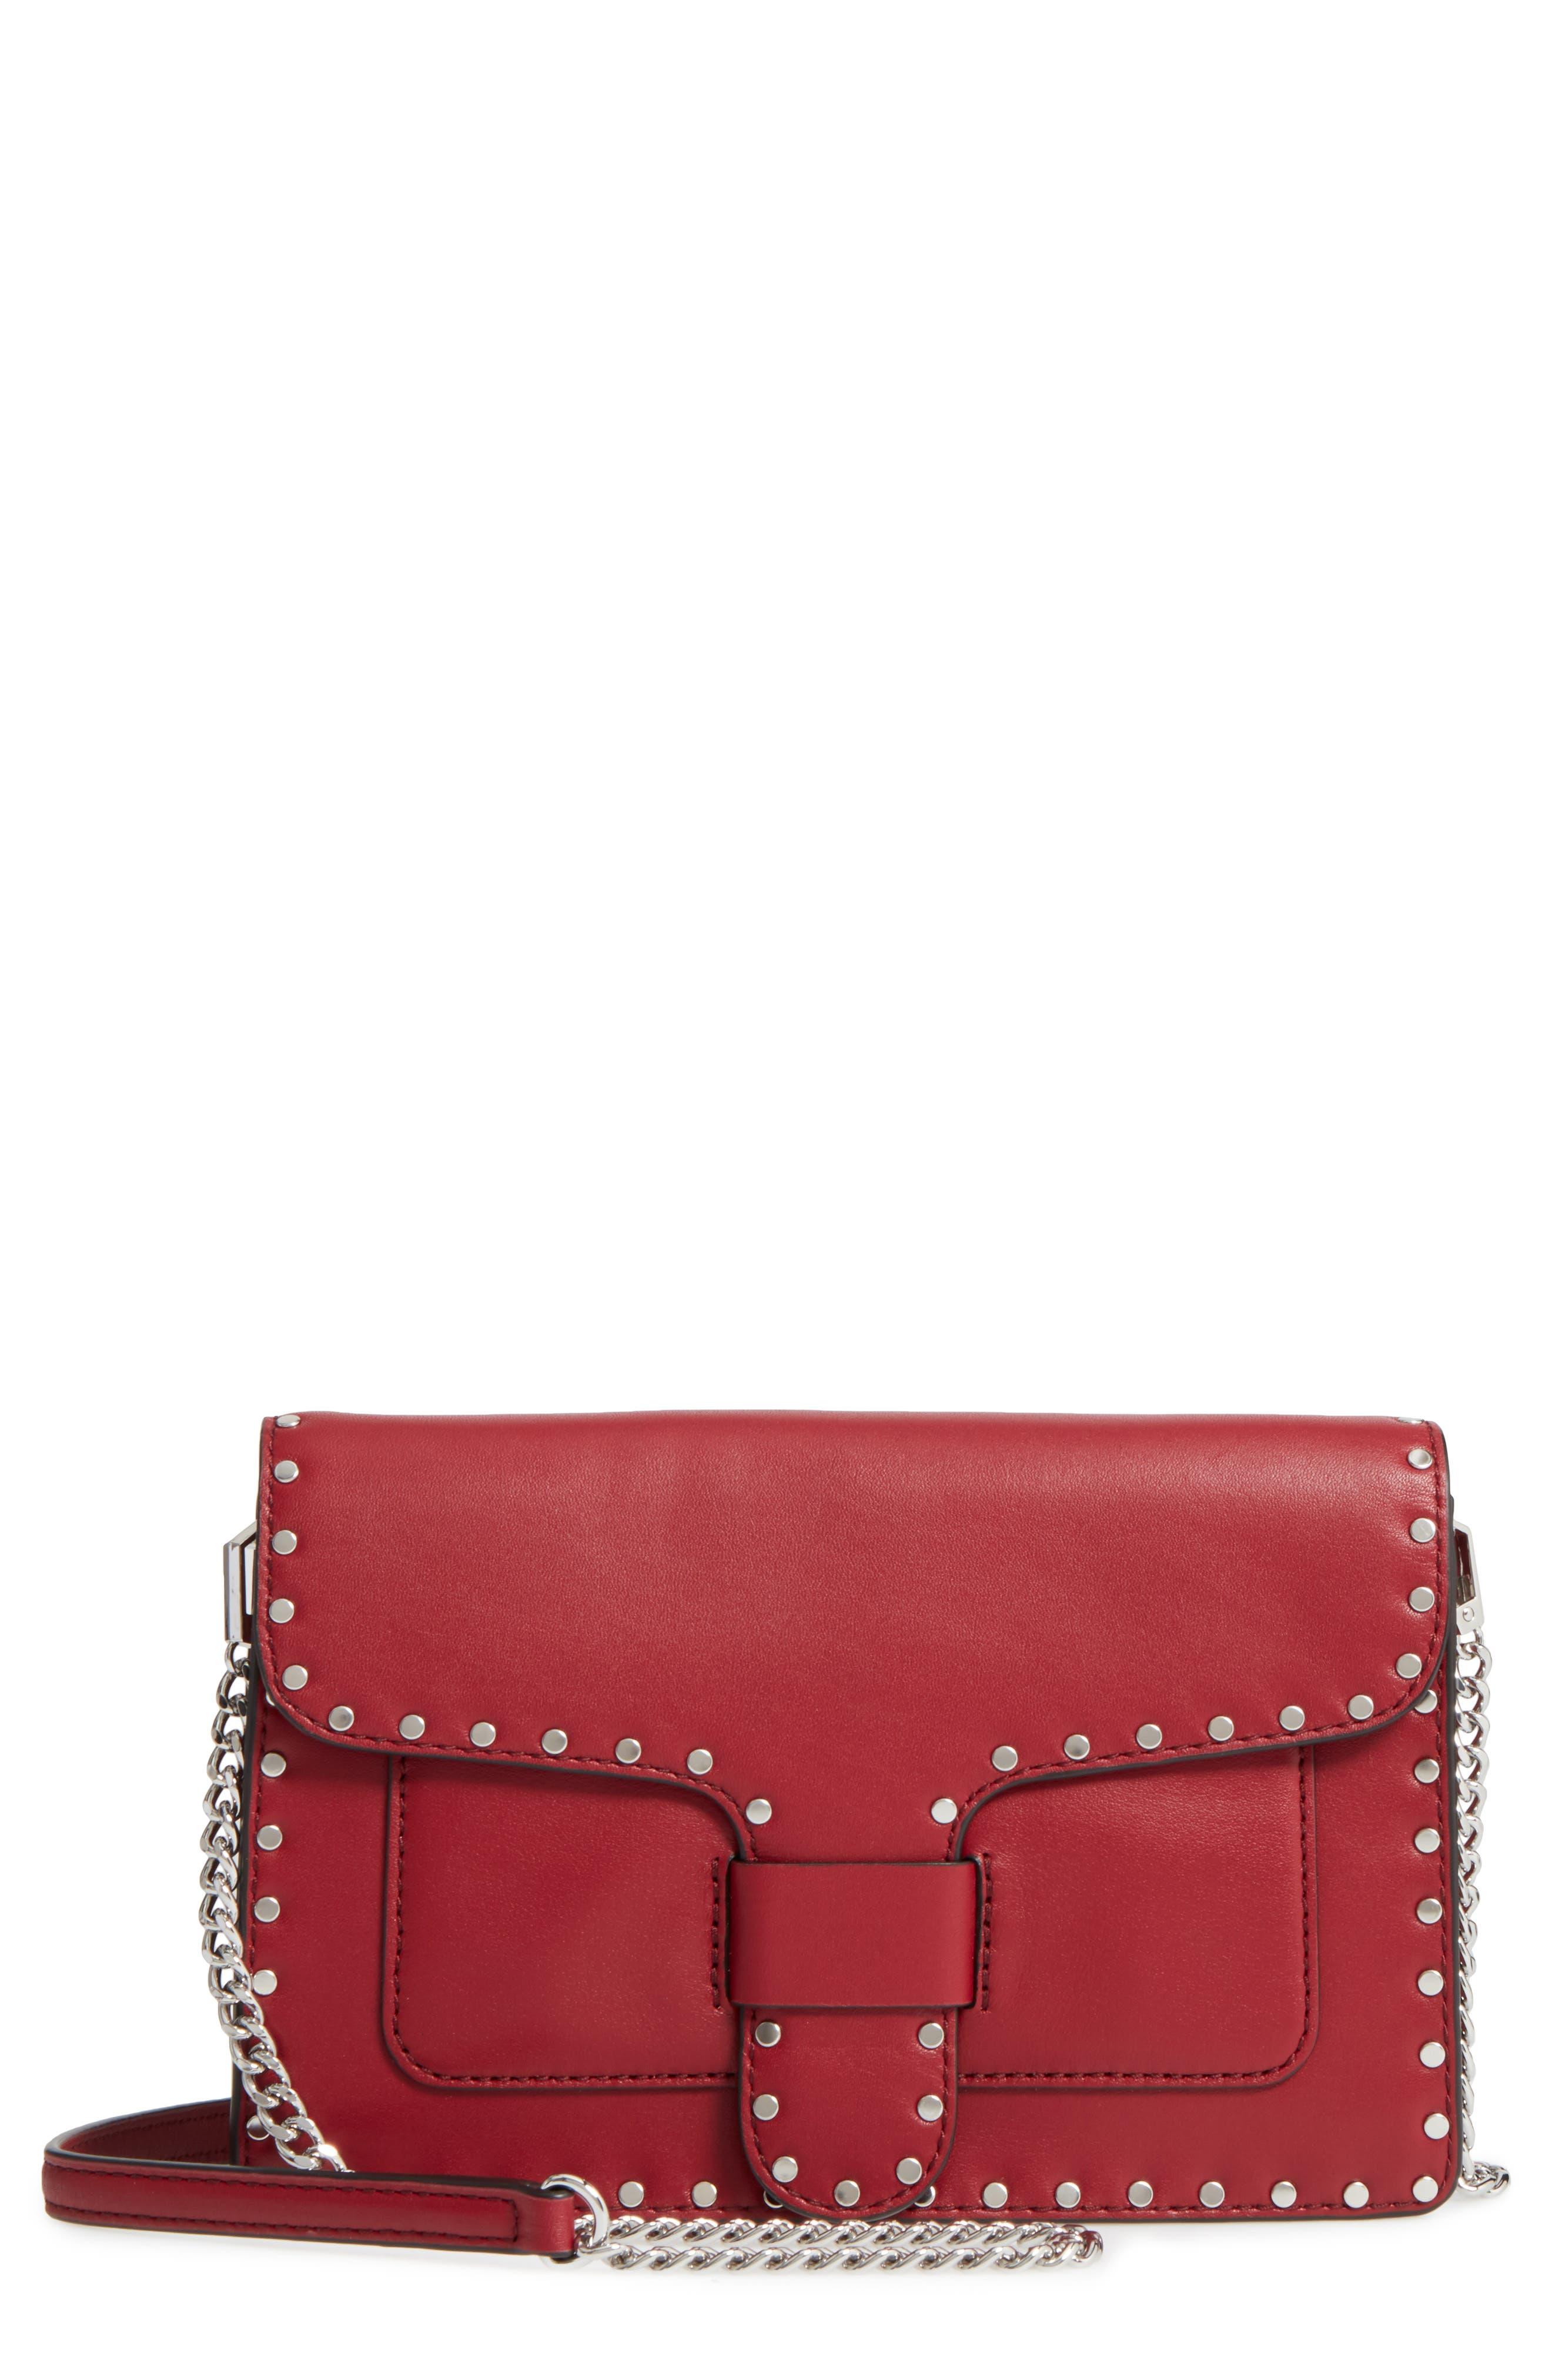 Medium Midnighter Leather Crossbody Bag,                         Main,                         color, Acai